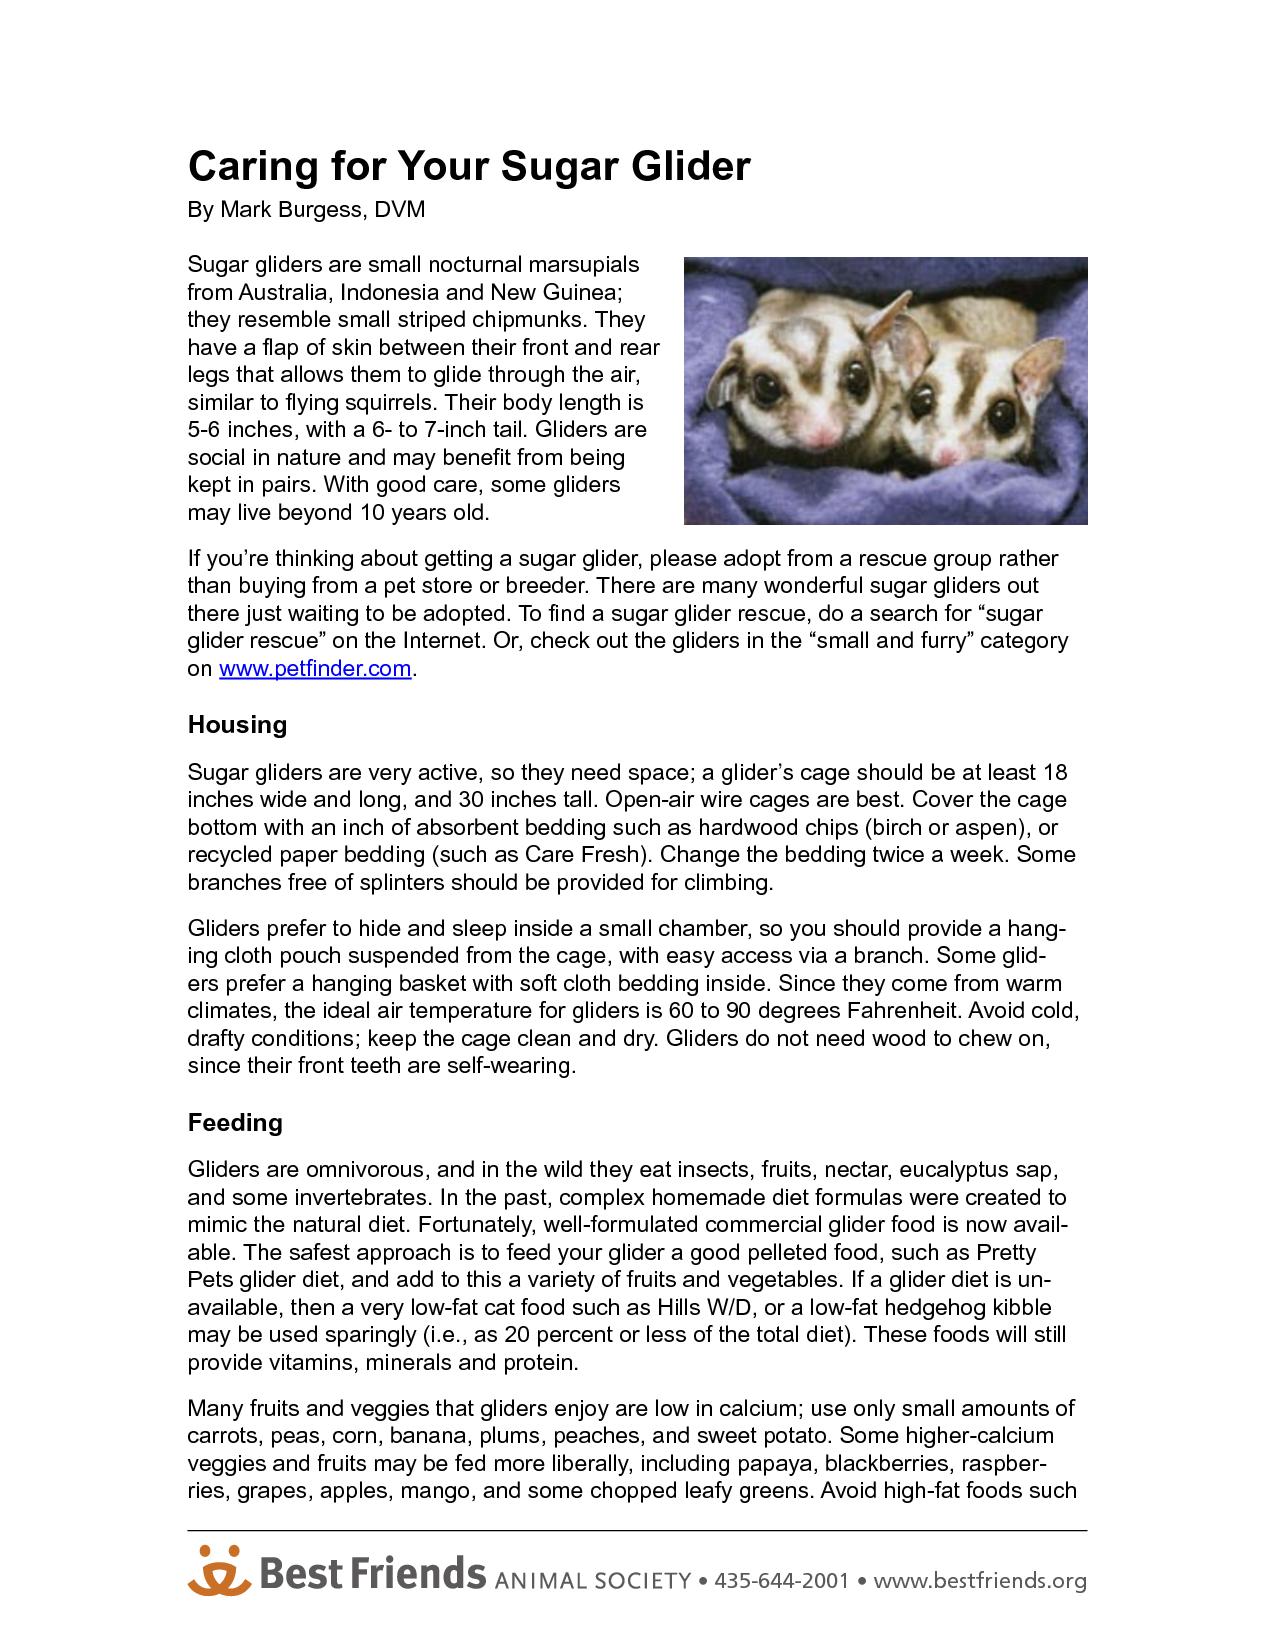 sugar glider facts - Google Search   SUGAR GLIDERS   Pinterest